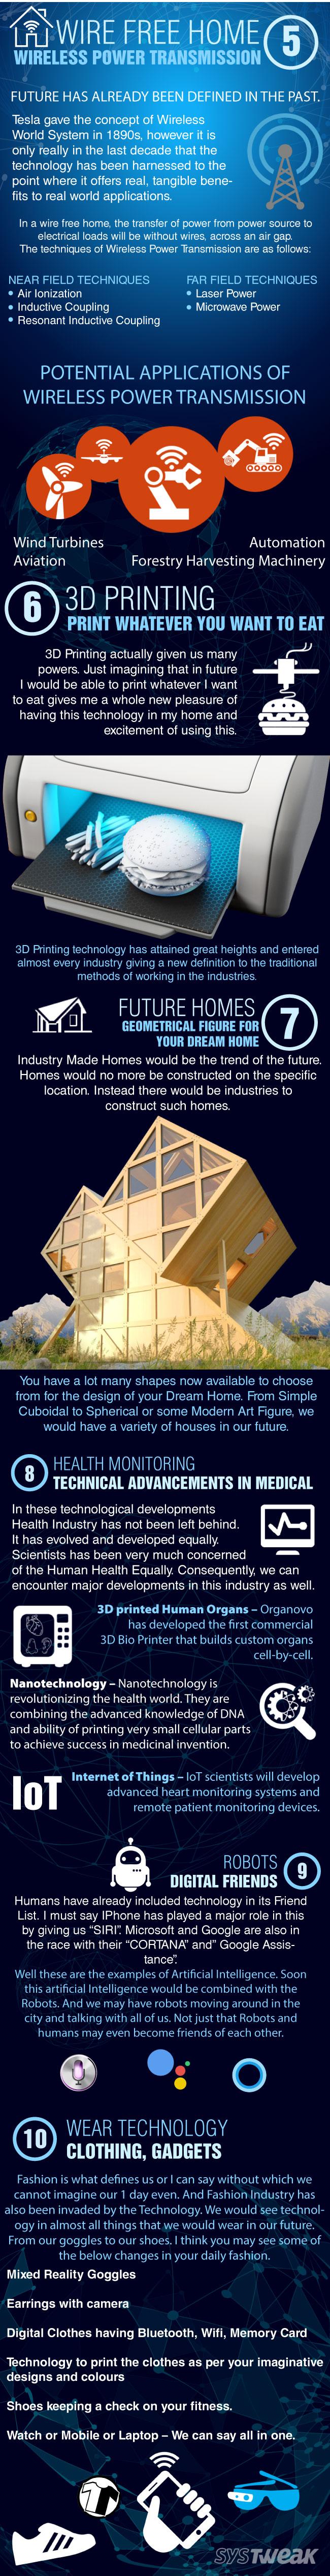 futuristic-innovations-